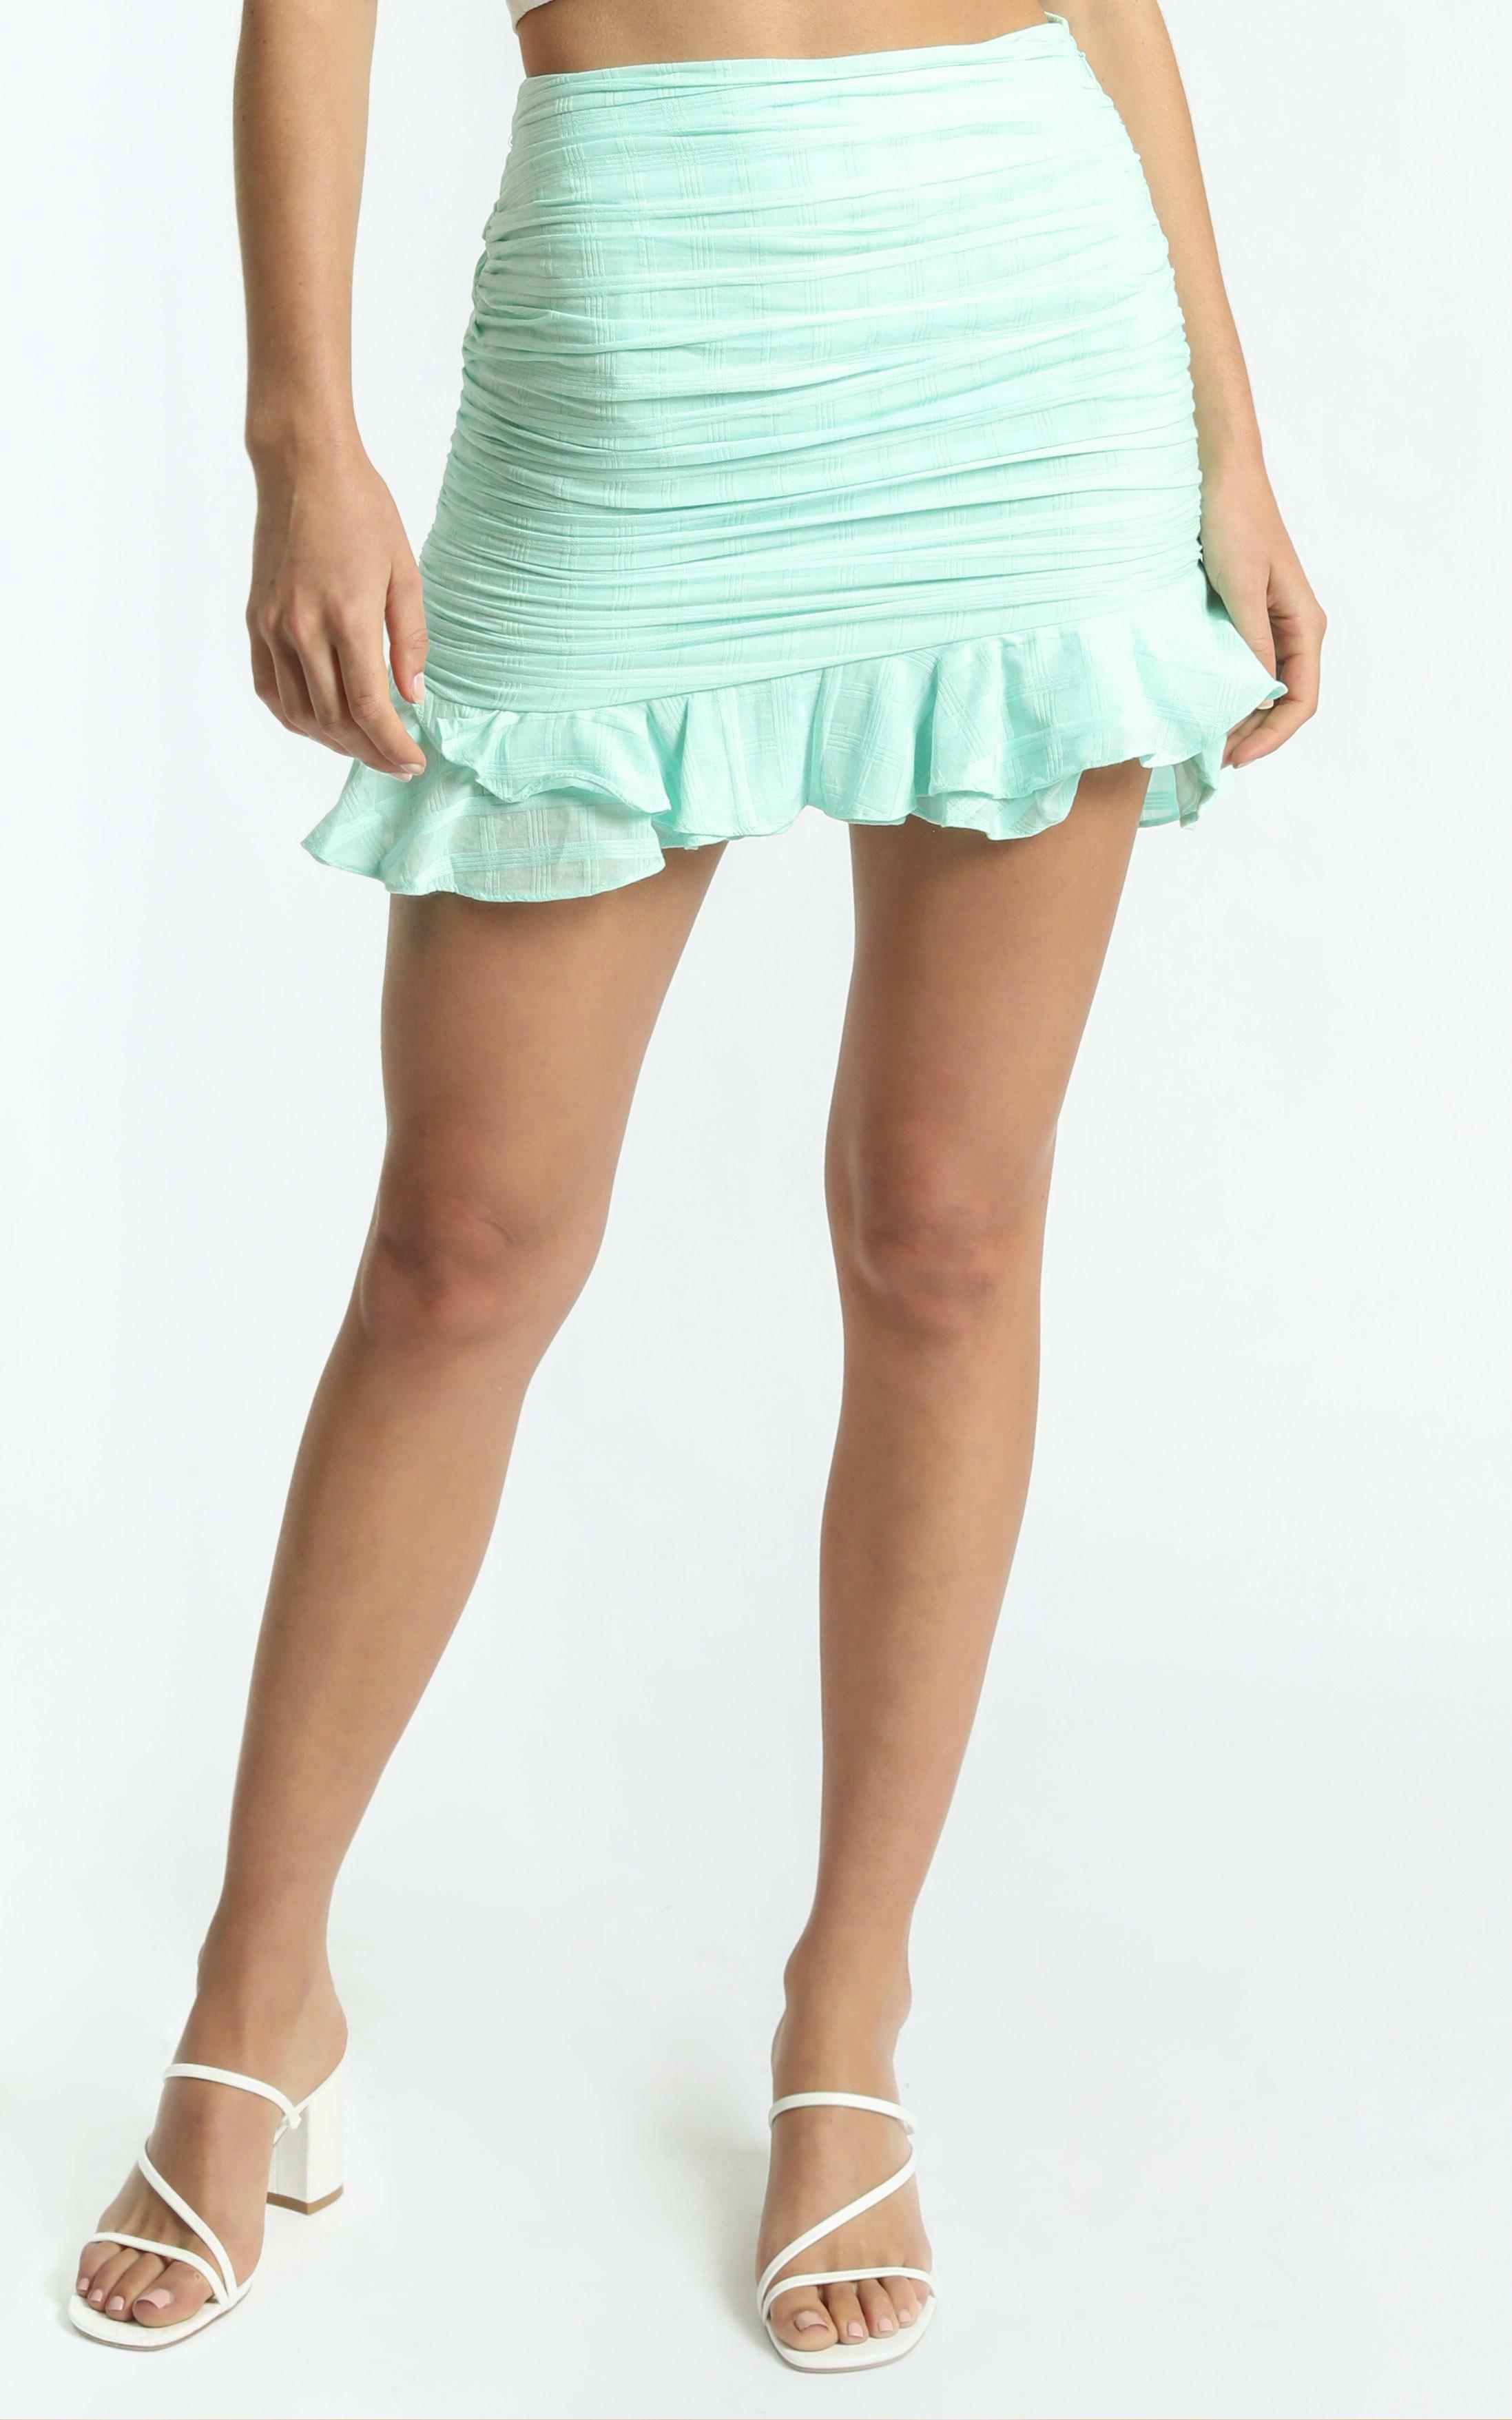 Bene Skirt in Mint - 06, GRN1, hi-res image number null